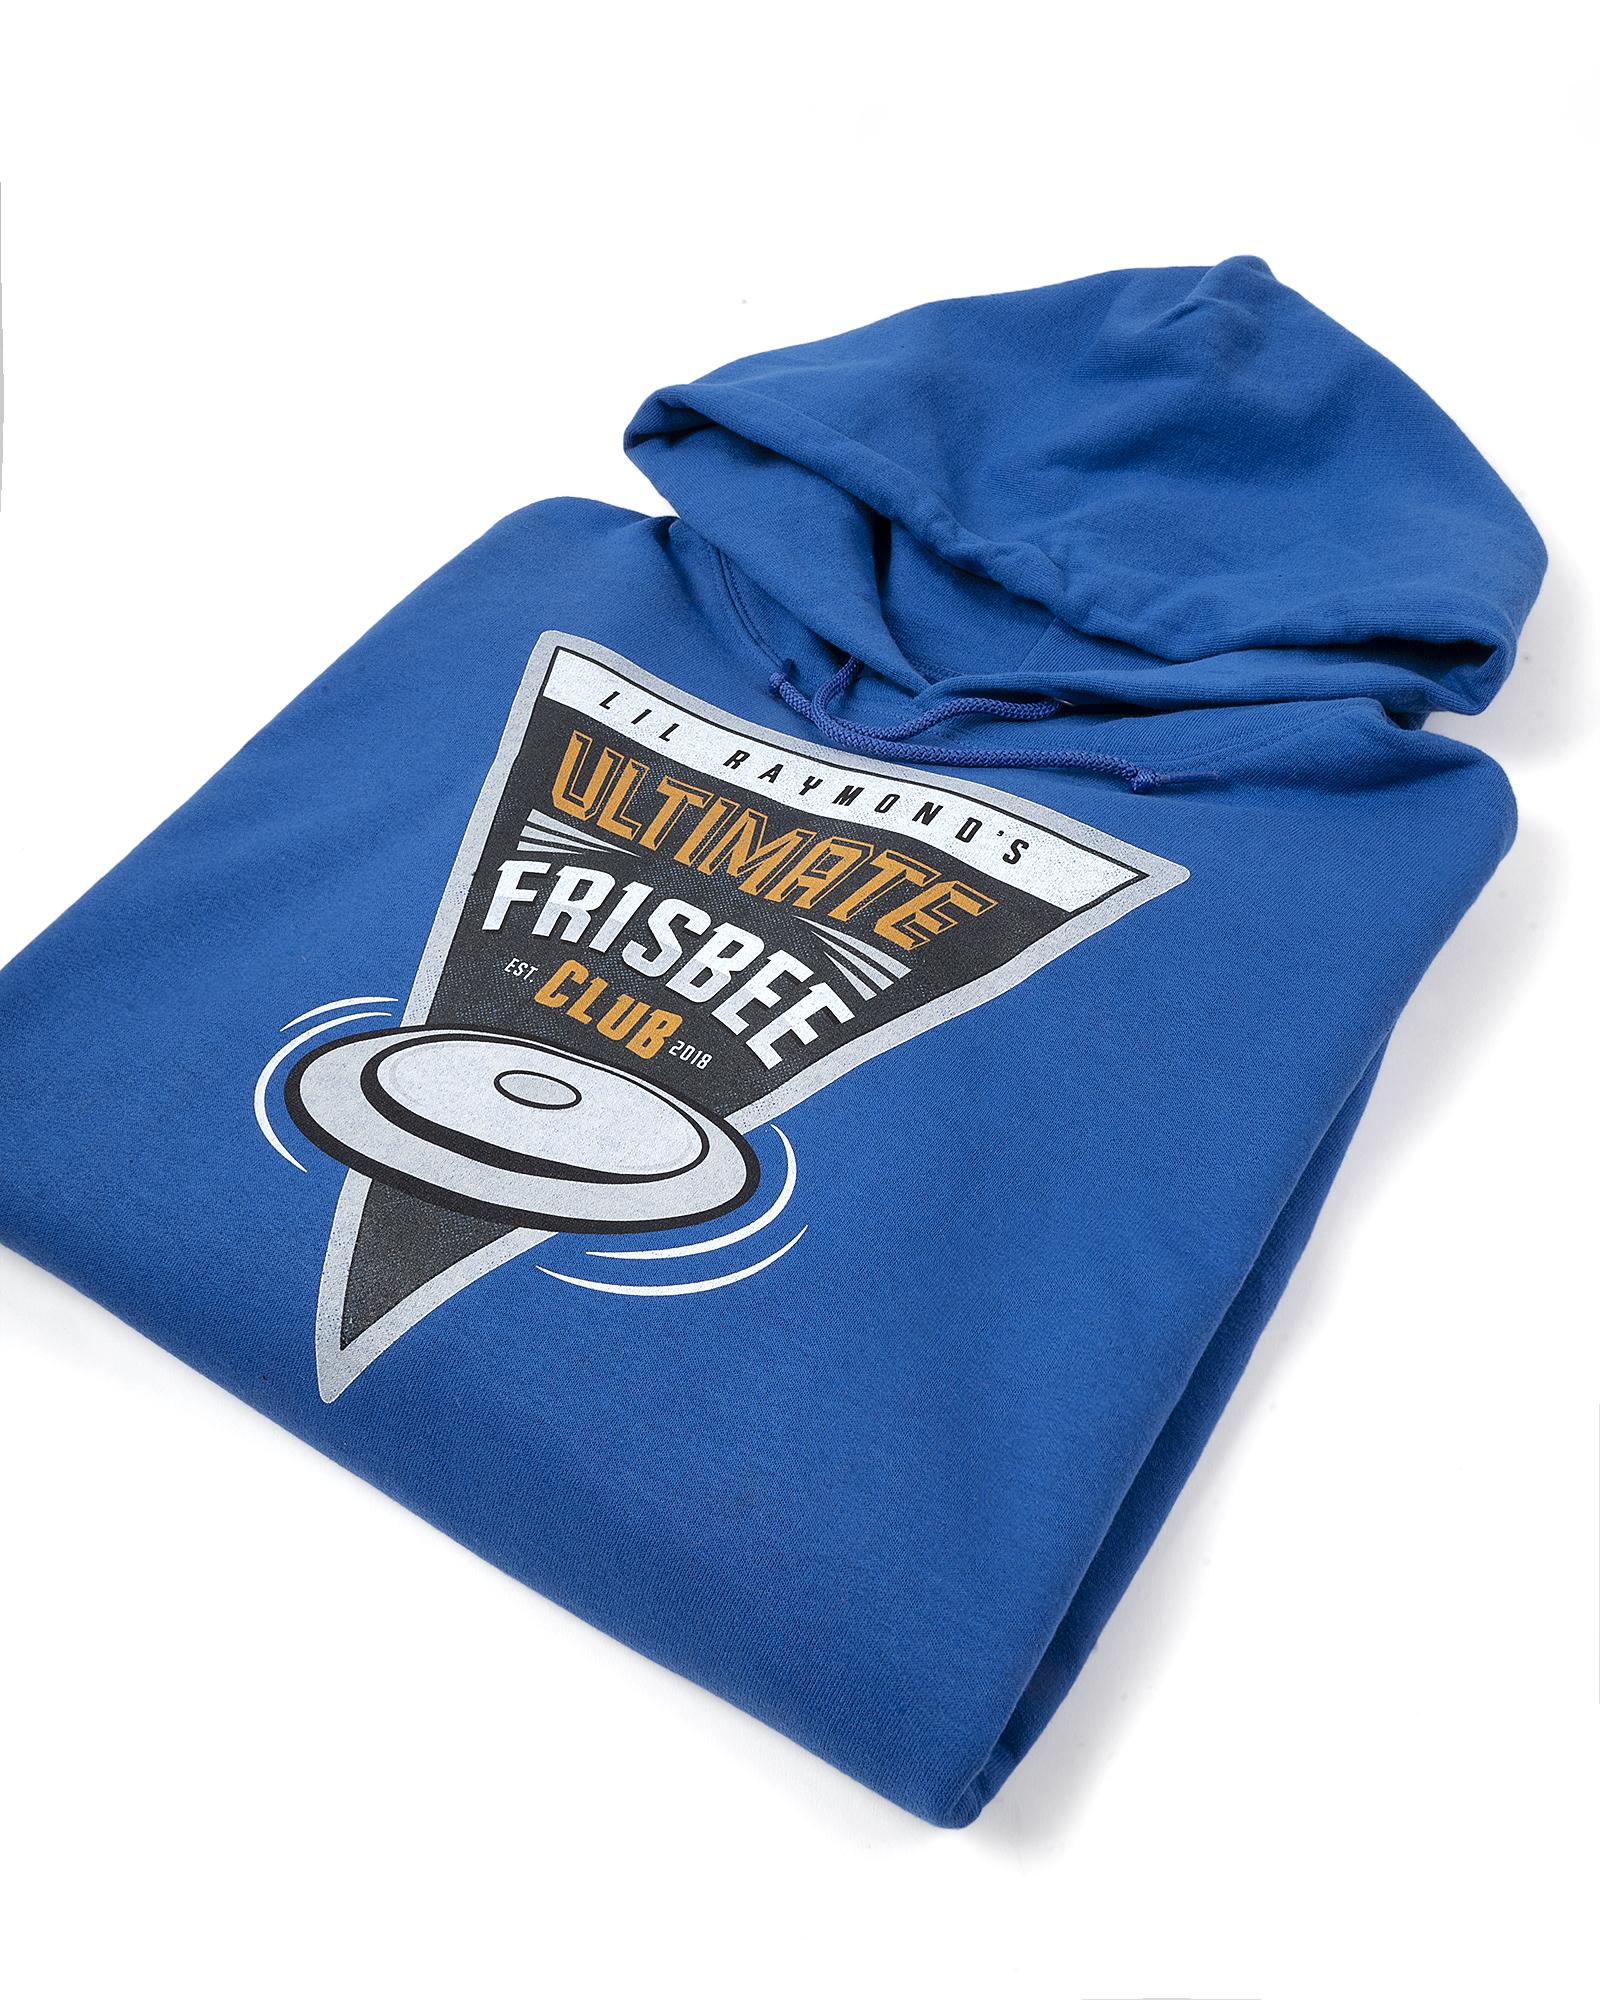 Fuel print of a Frisbee Club on a folded blue hoodie